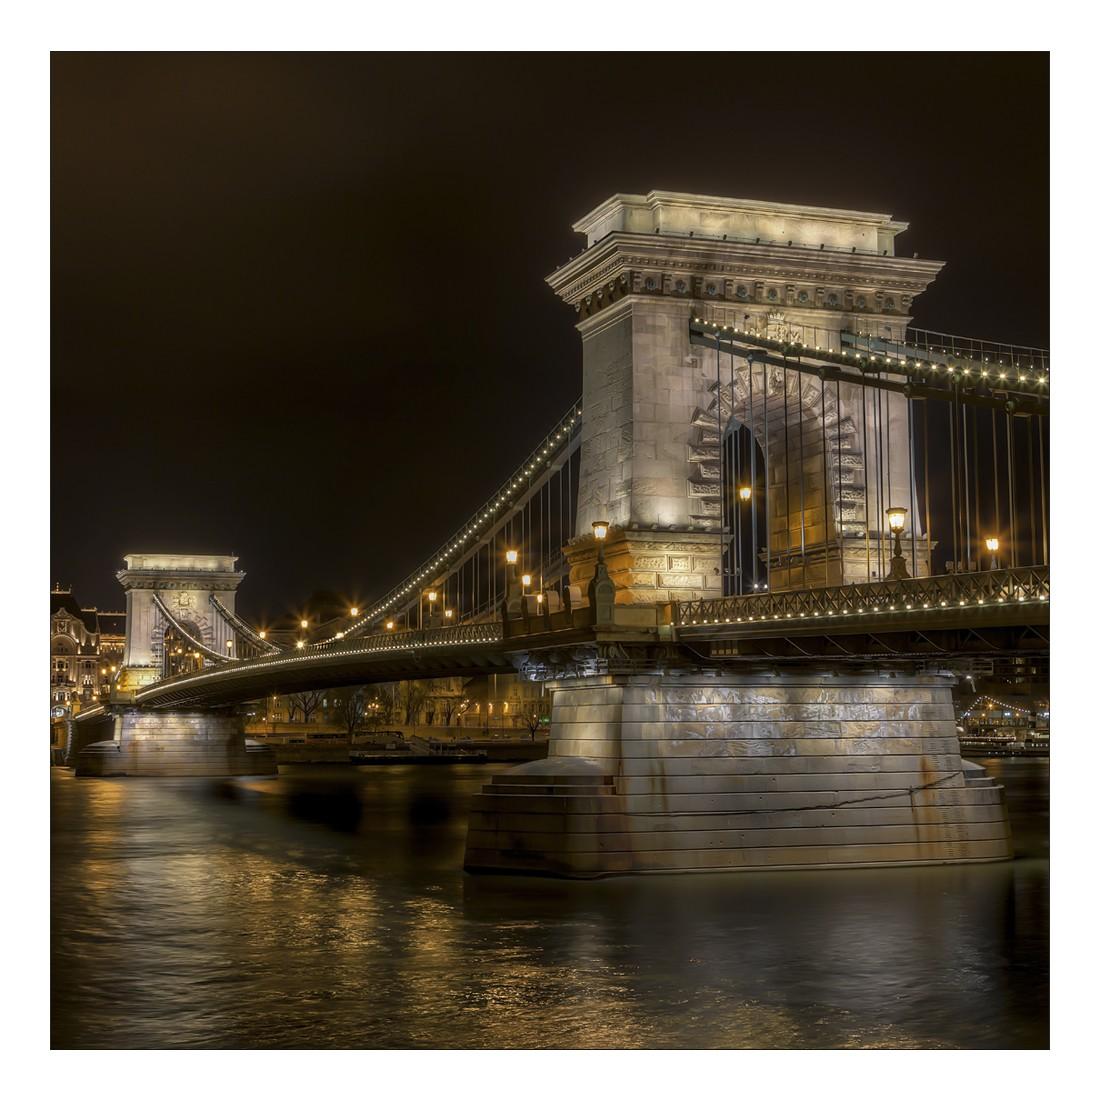 Leinwandbild BUDAPEST BRIDGE – Abmessung 100 x 75 cm, Gallery of Innovative Art jetzt kaufen